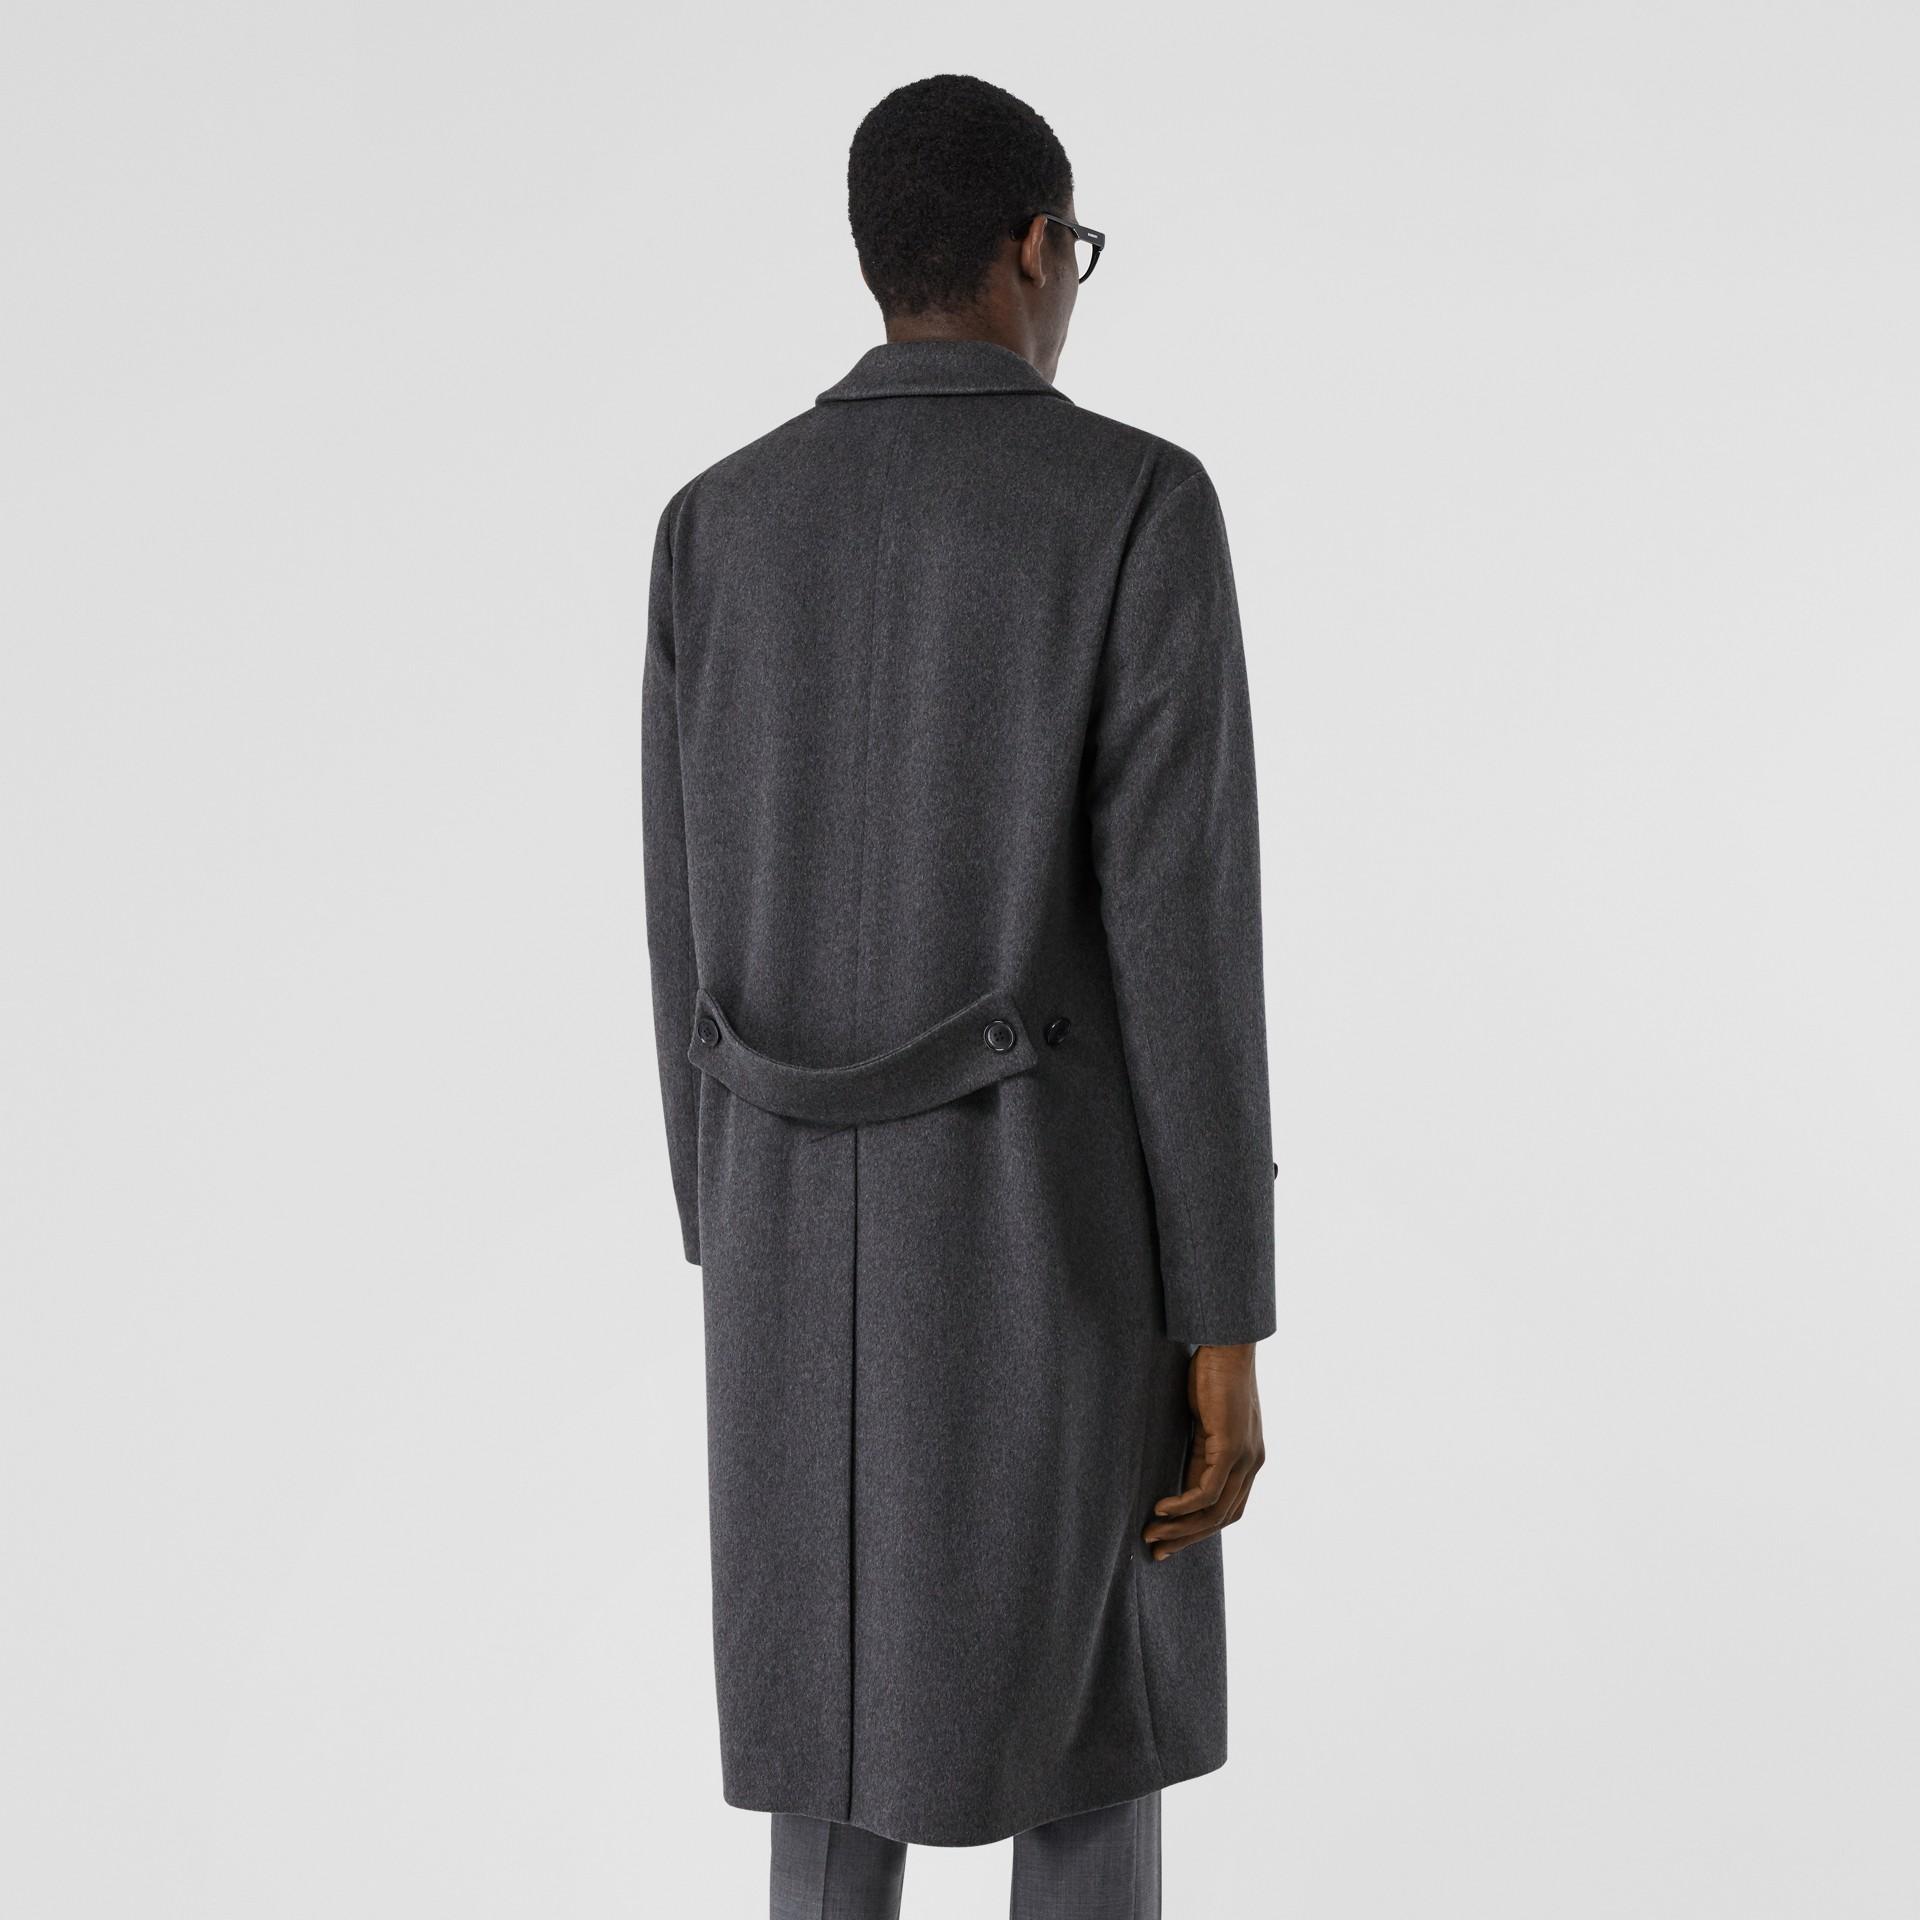 Cashmere Lab Coat in Pewter Melange - Men   Burberry - gallery image 2